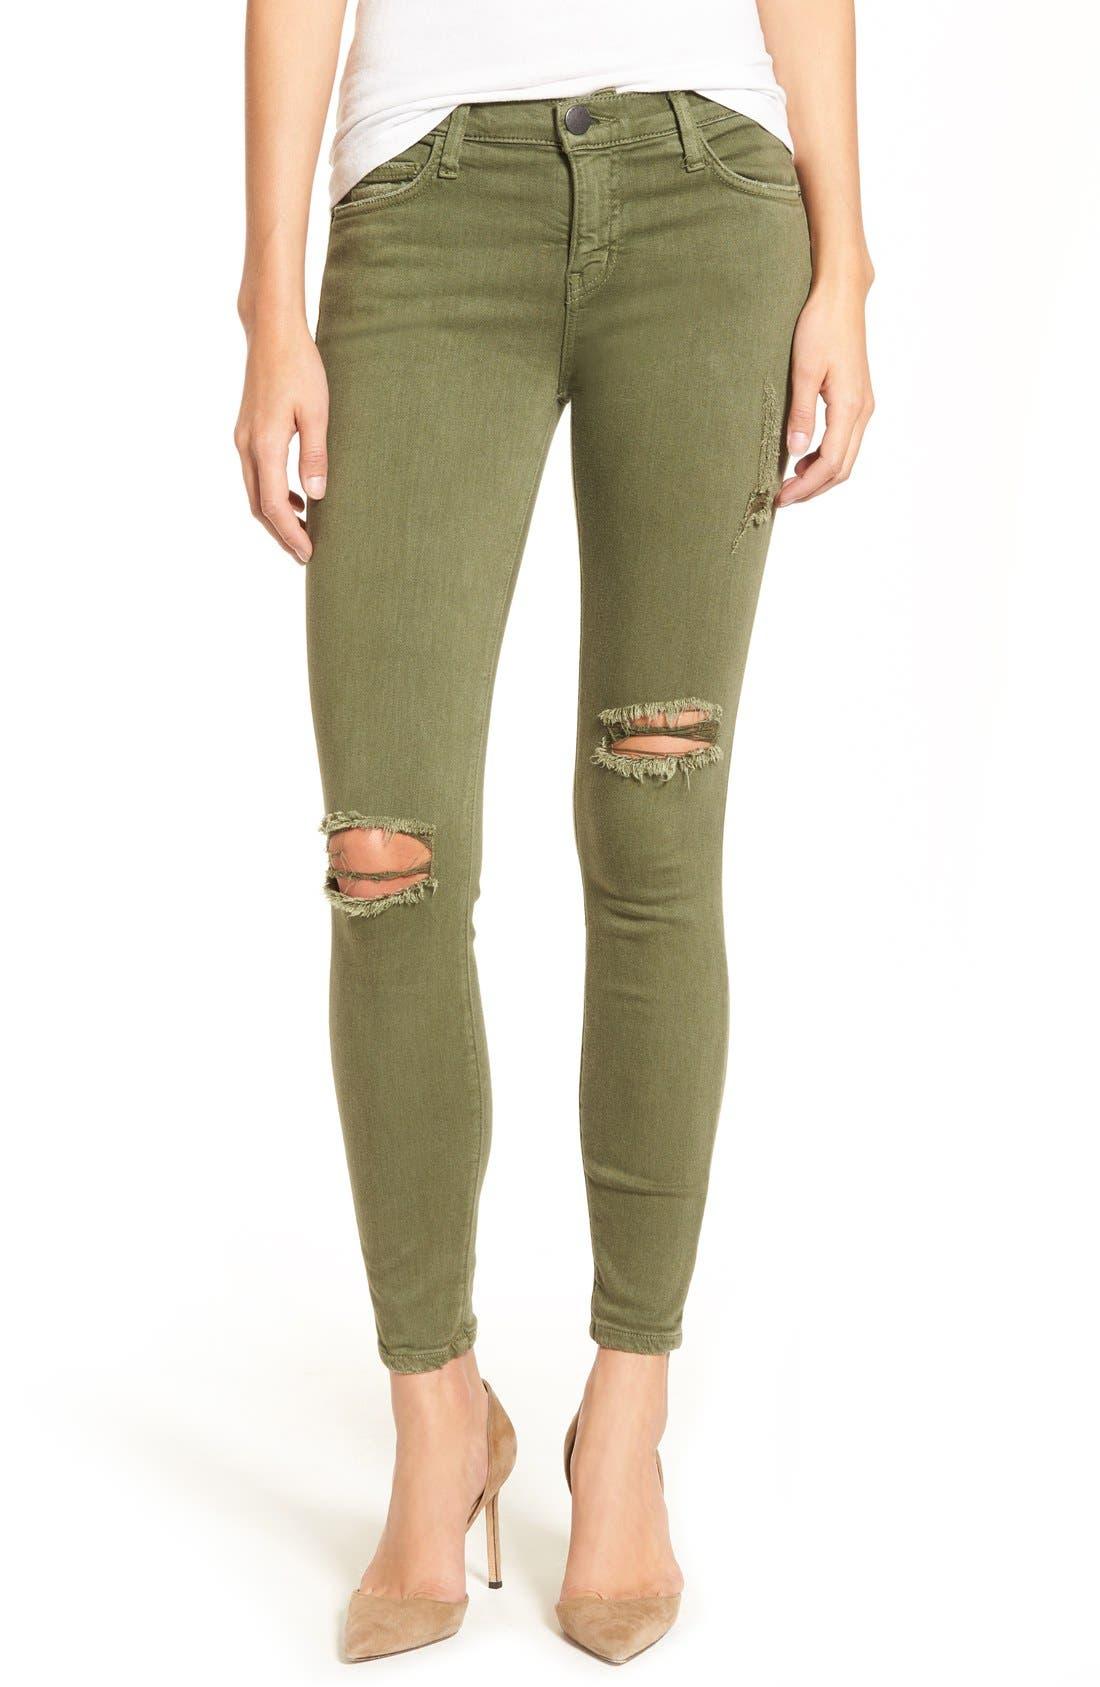 Alternate Image 1 Selected - Current/Elliott 'The Stiletto' Crop Skinny Jeans